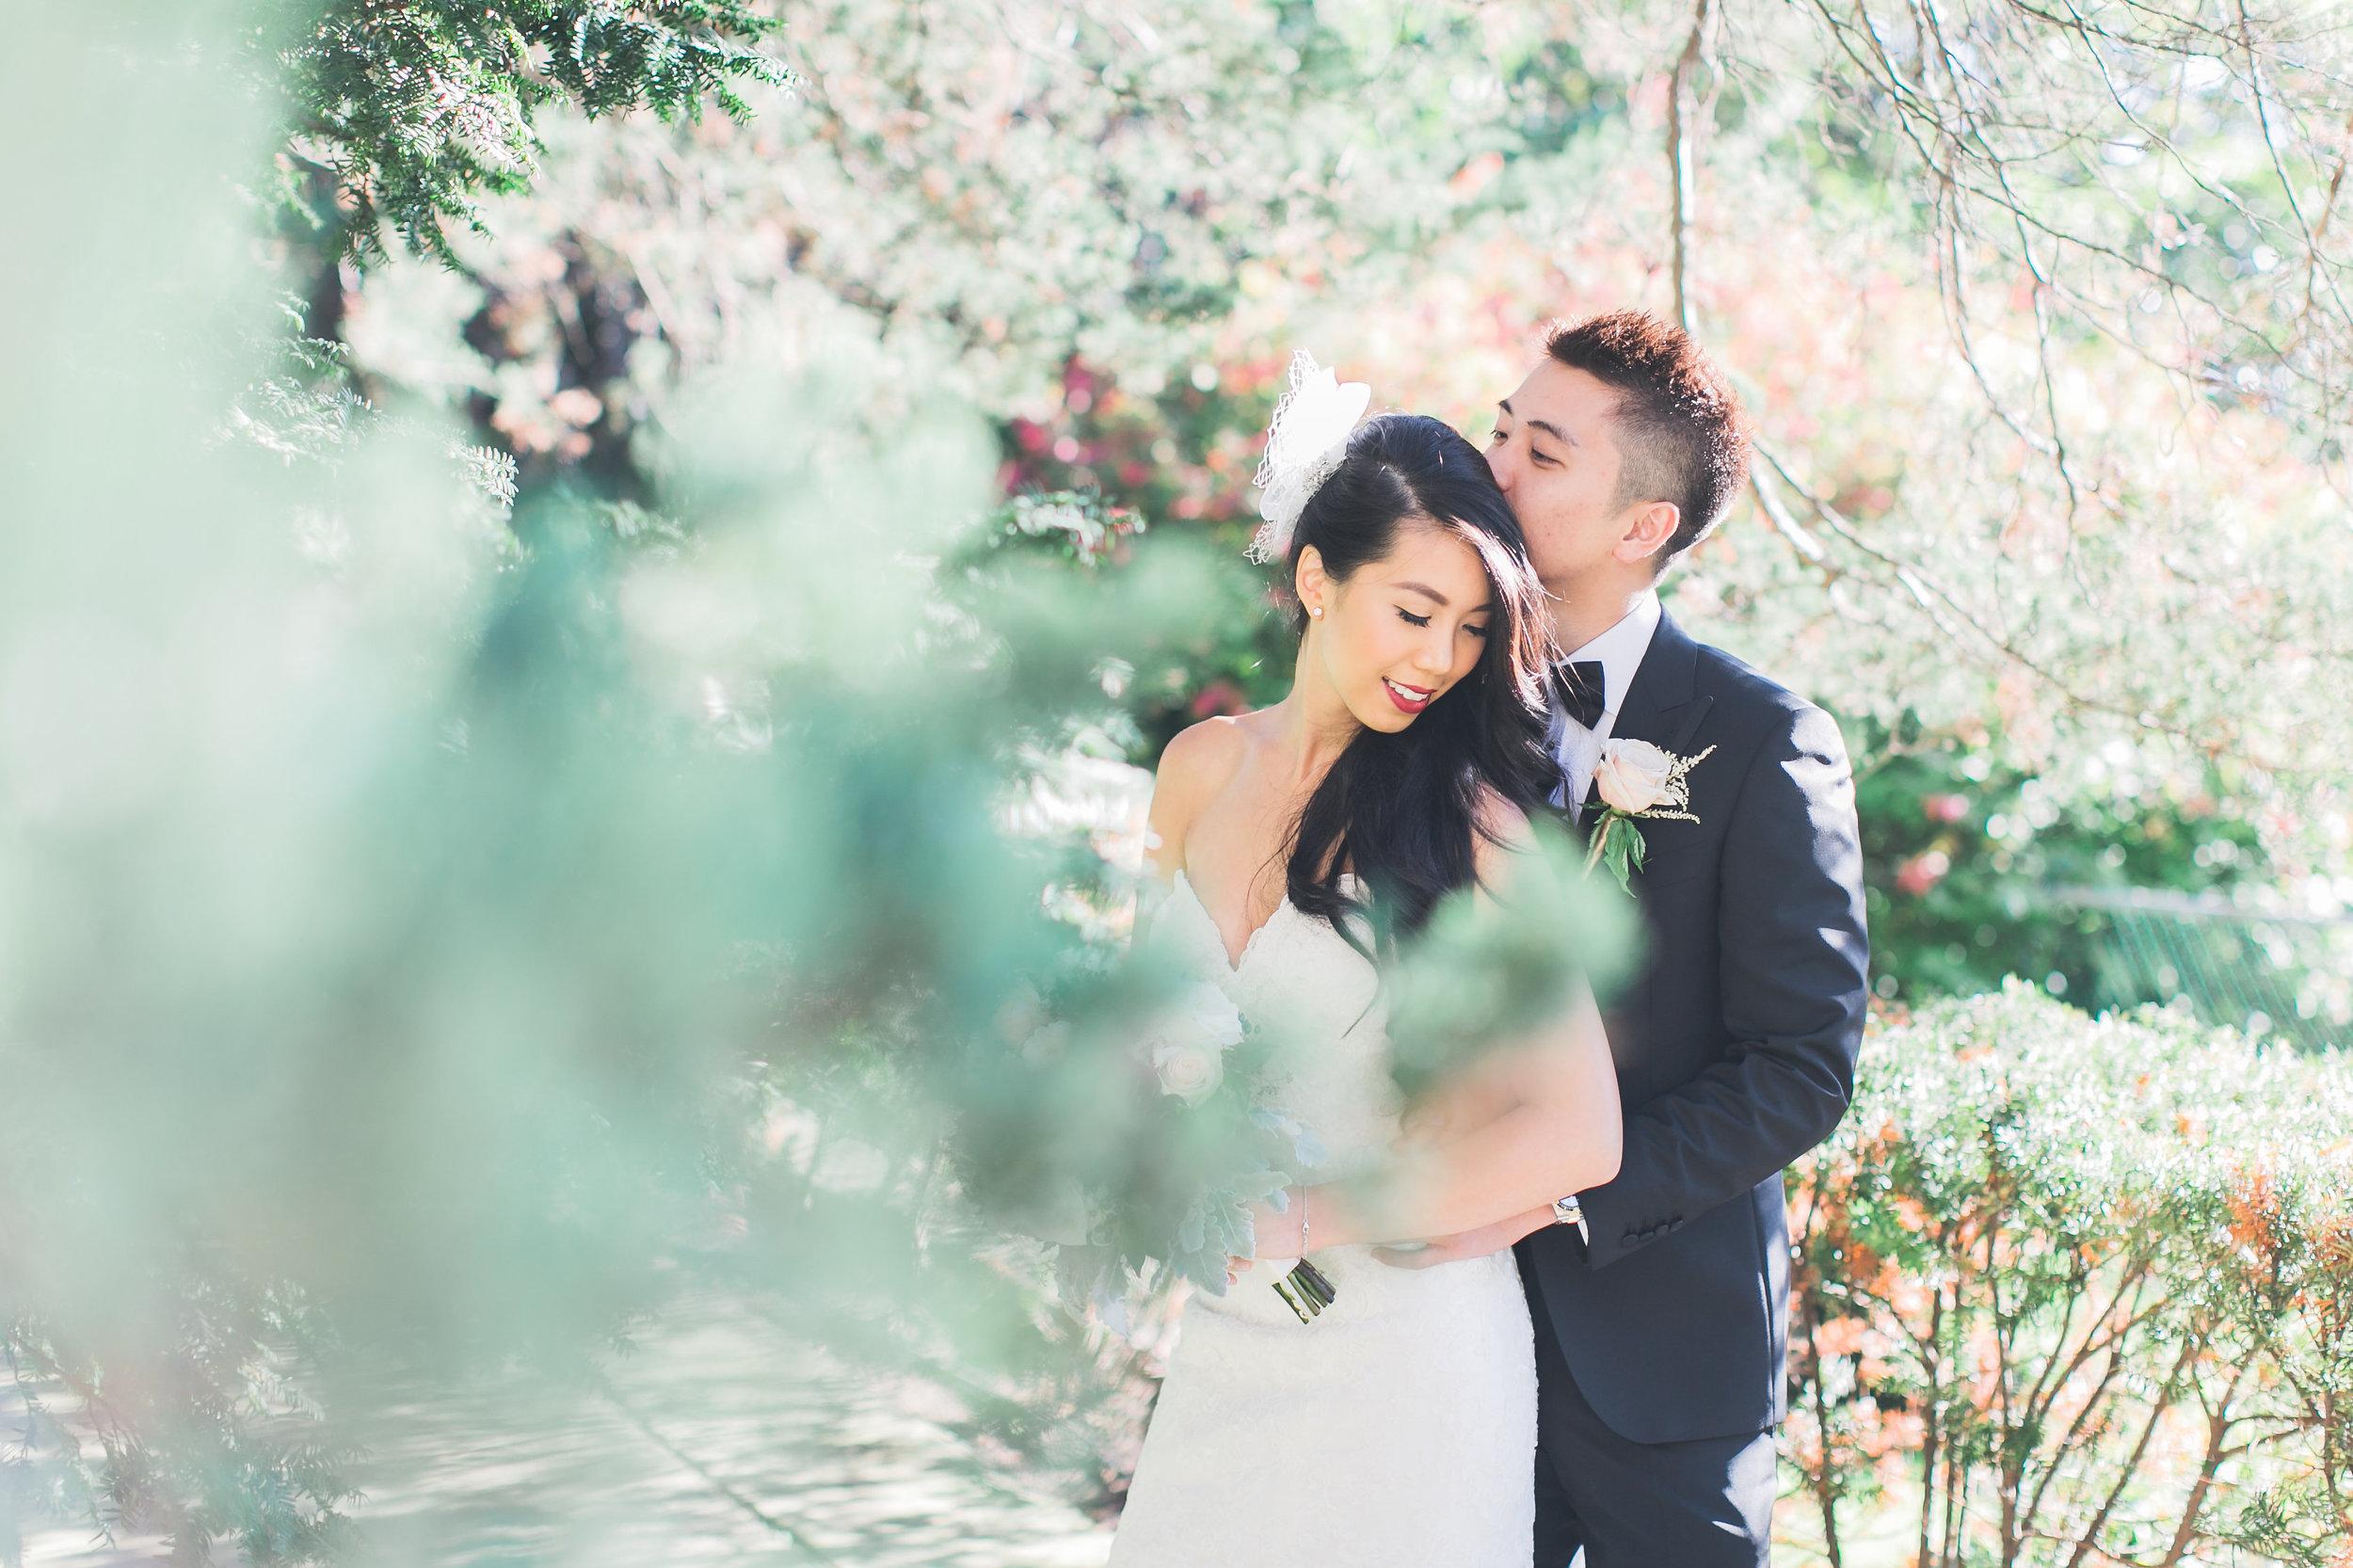 Phoebe Lo Events Toronto Wedding - Graydon Hall Manor Garden Charm Event 016.jpg